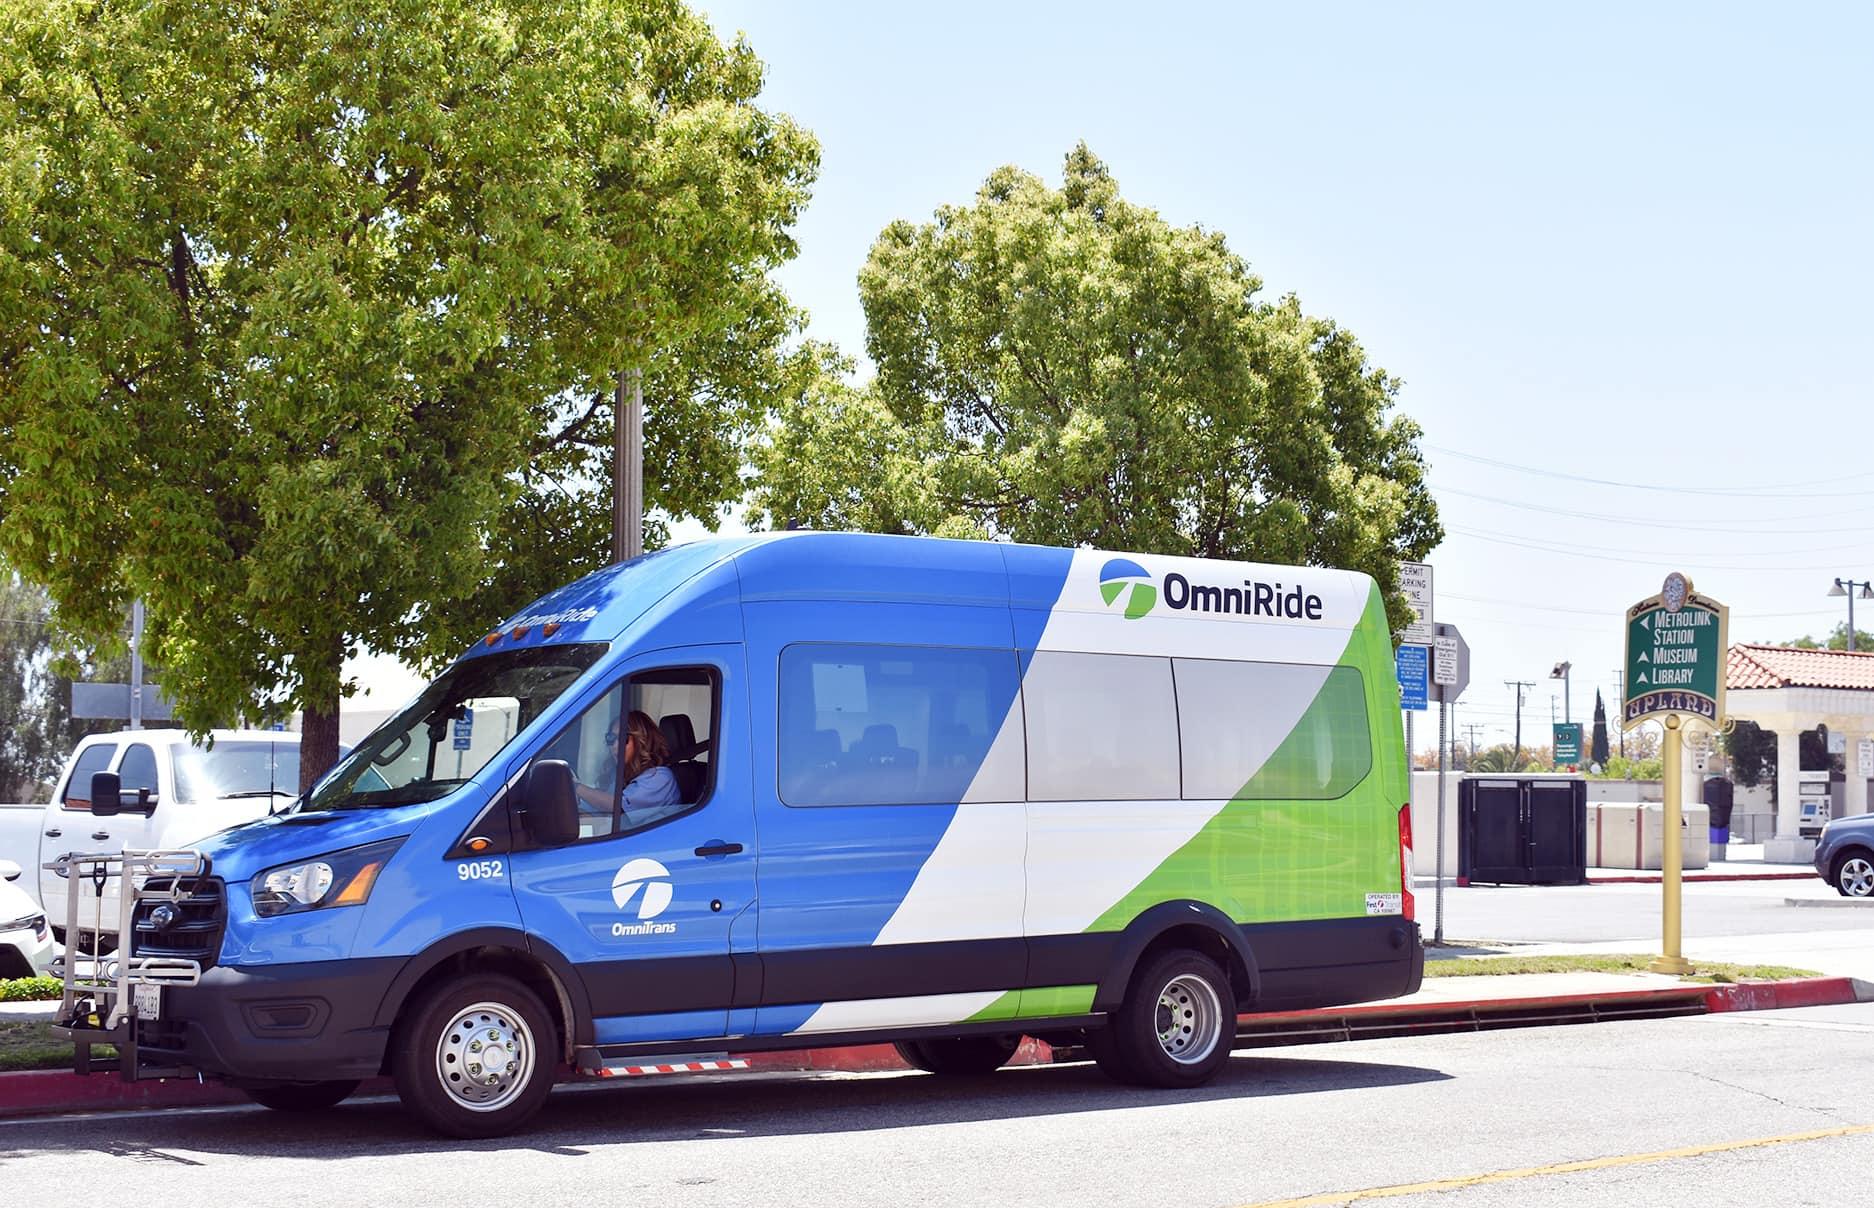 Get to Know OmniRide Upland, New On-Demand Transit Service!